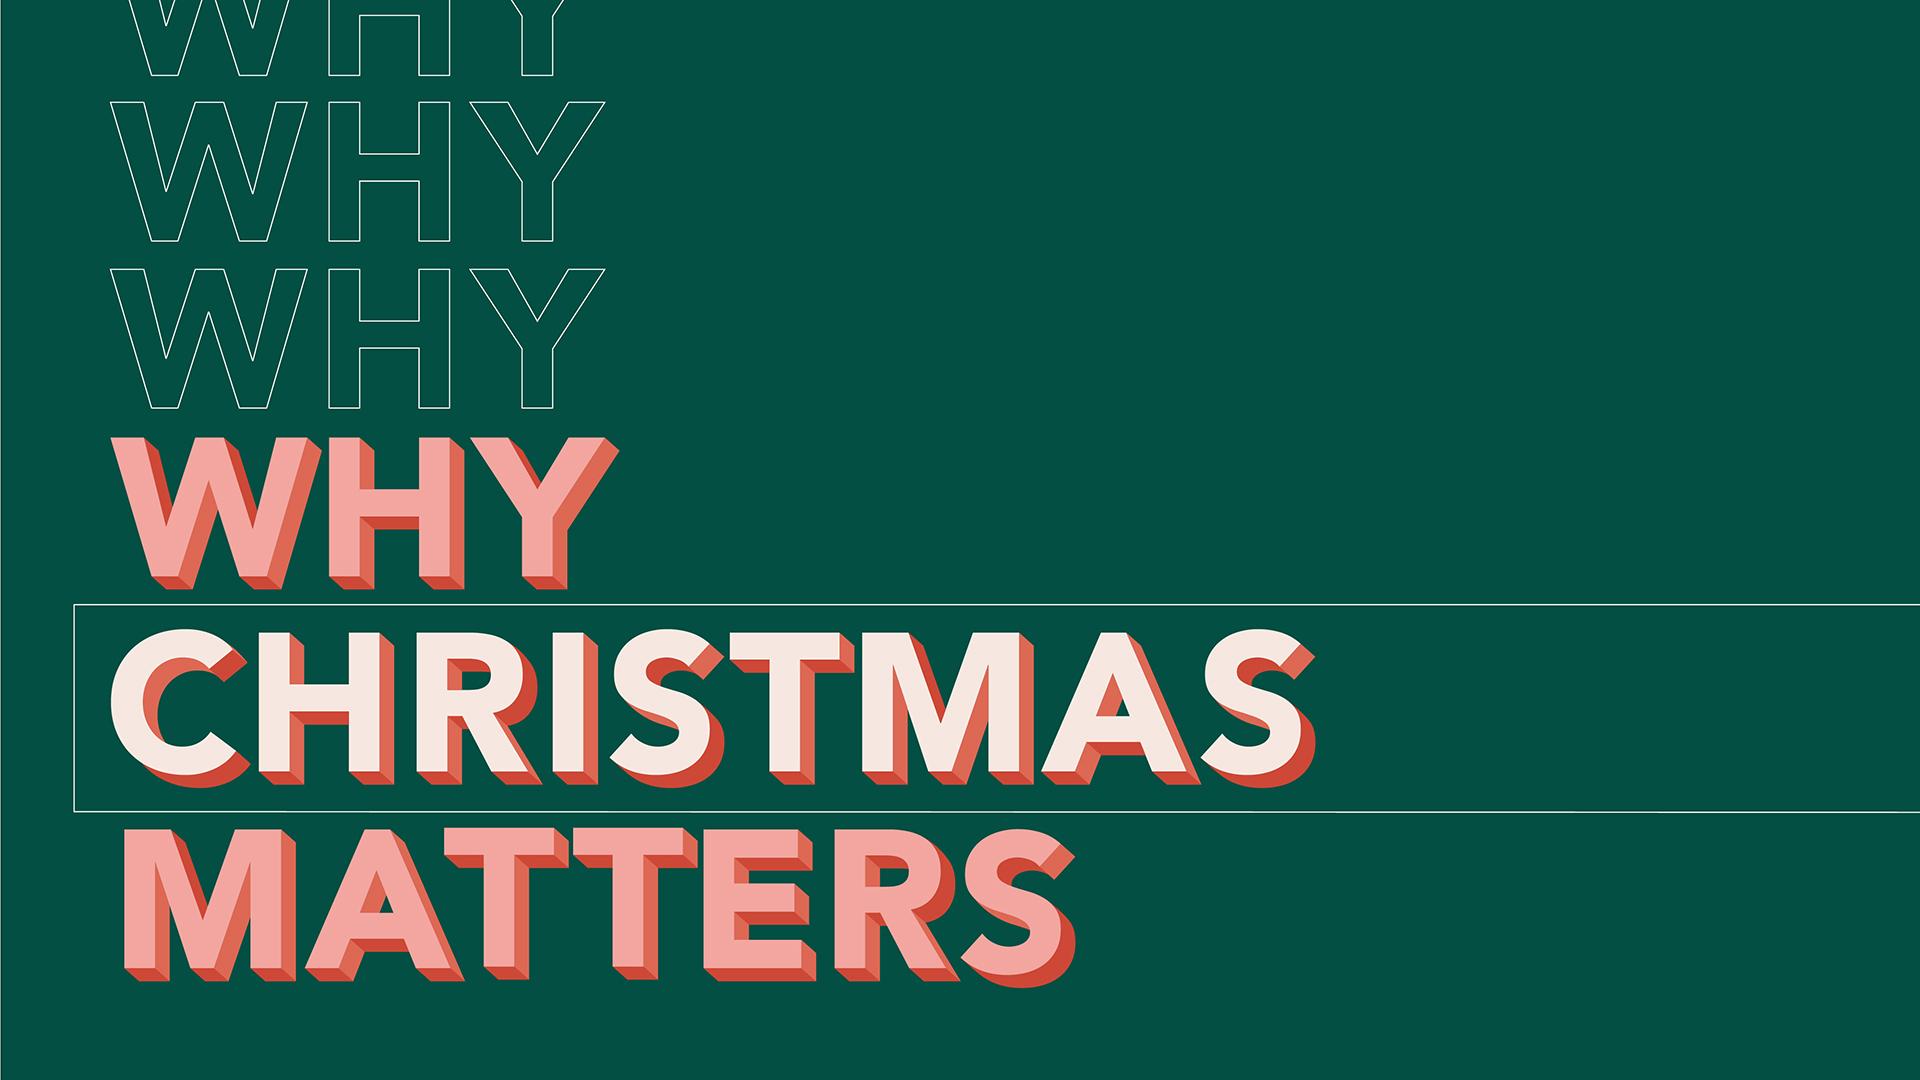 Why Christmas Matters Hero Image